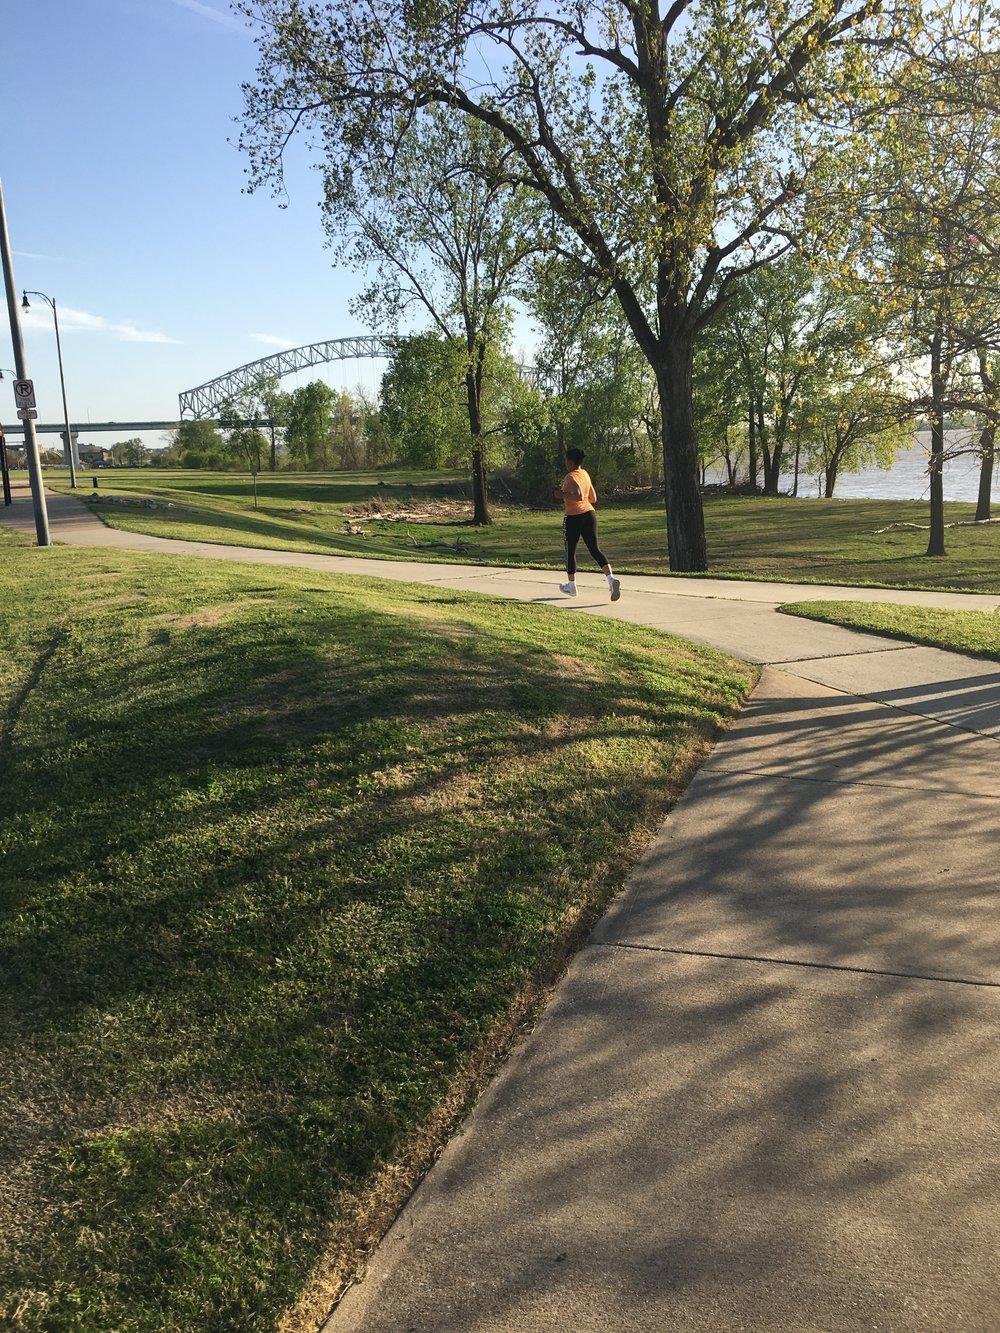 Andrea Fenise Memphis Fashion Blogger shares #40before40 Run A Full Marathon Goal